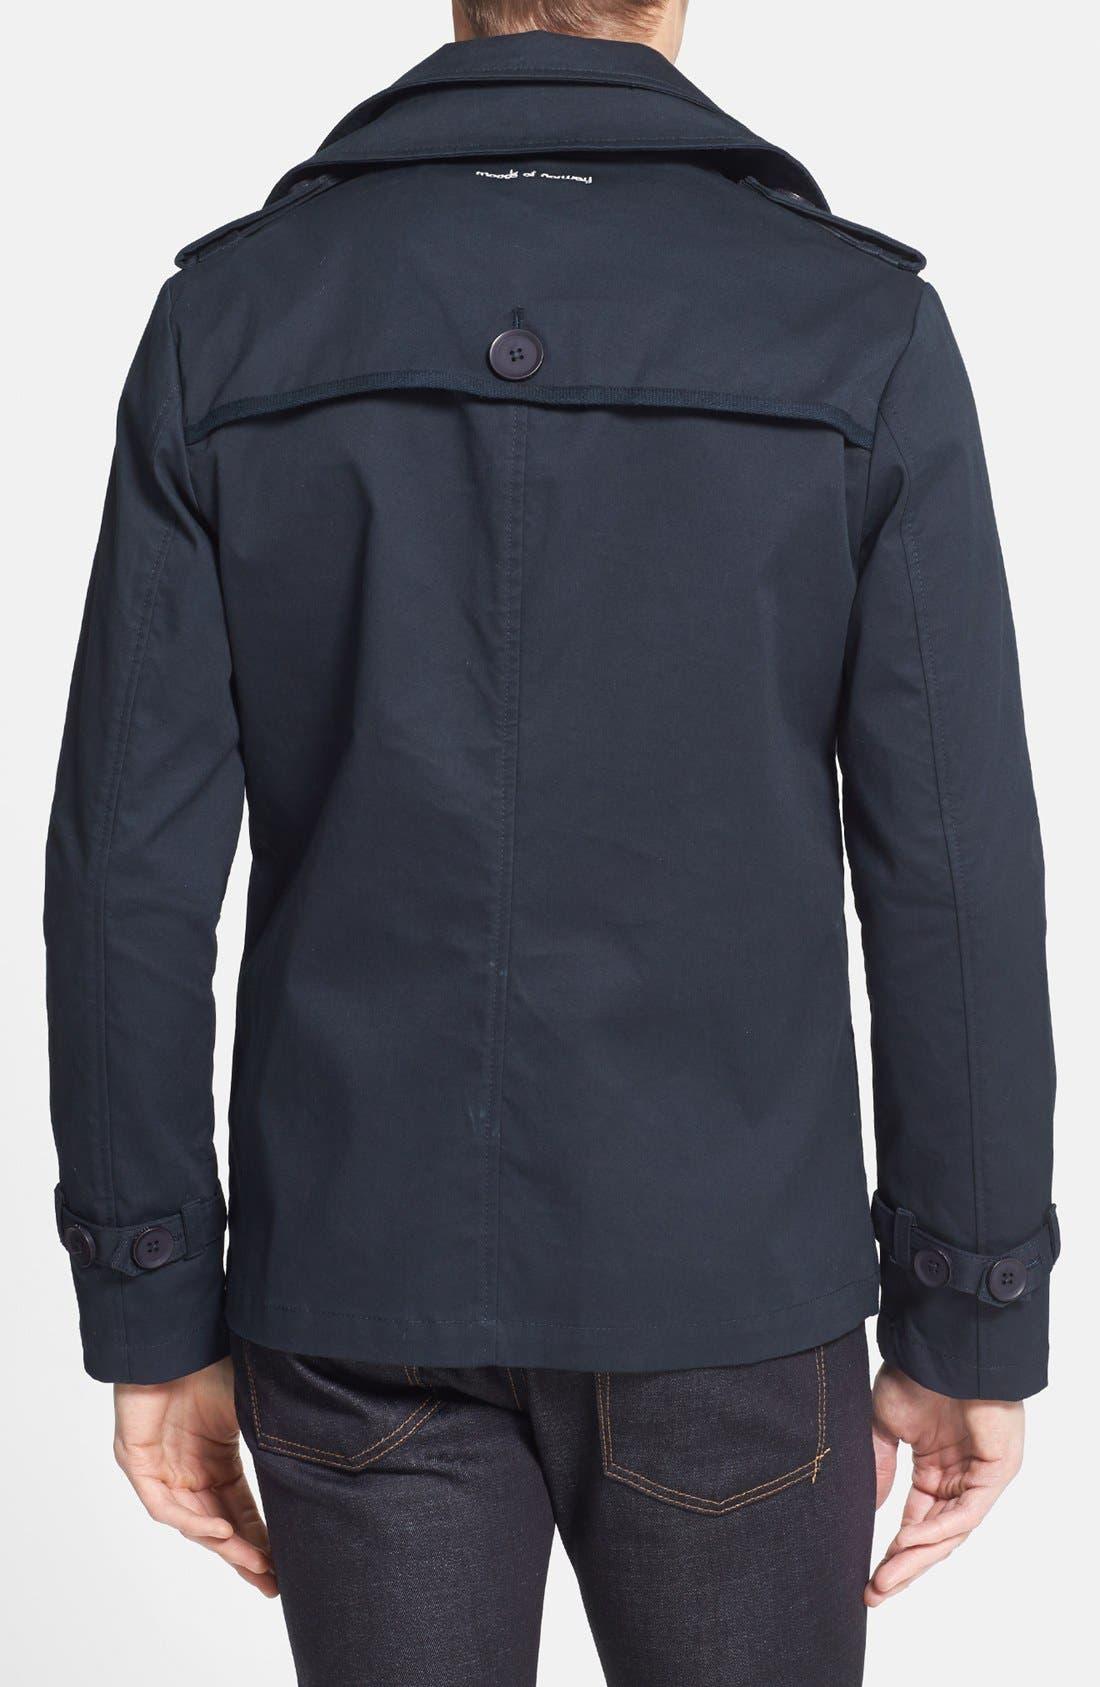 Alternate Image 2  - Moods of Norway 'Jan Engil' Double Breasted Cotton Jacket